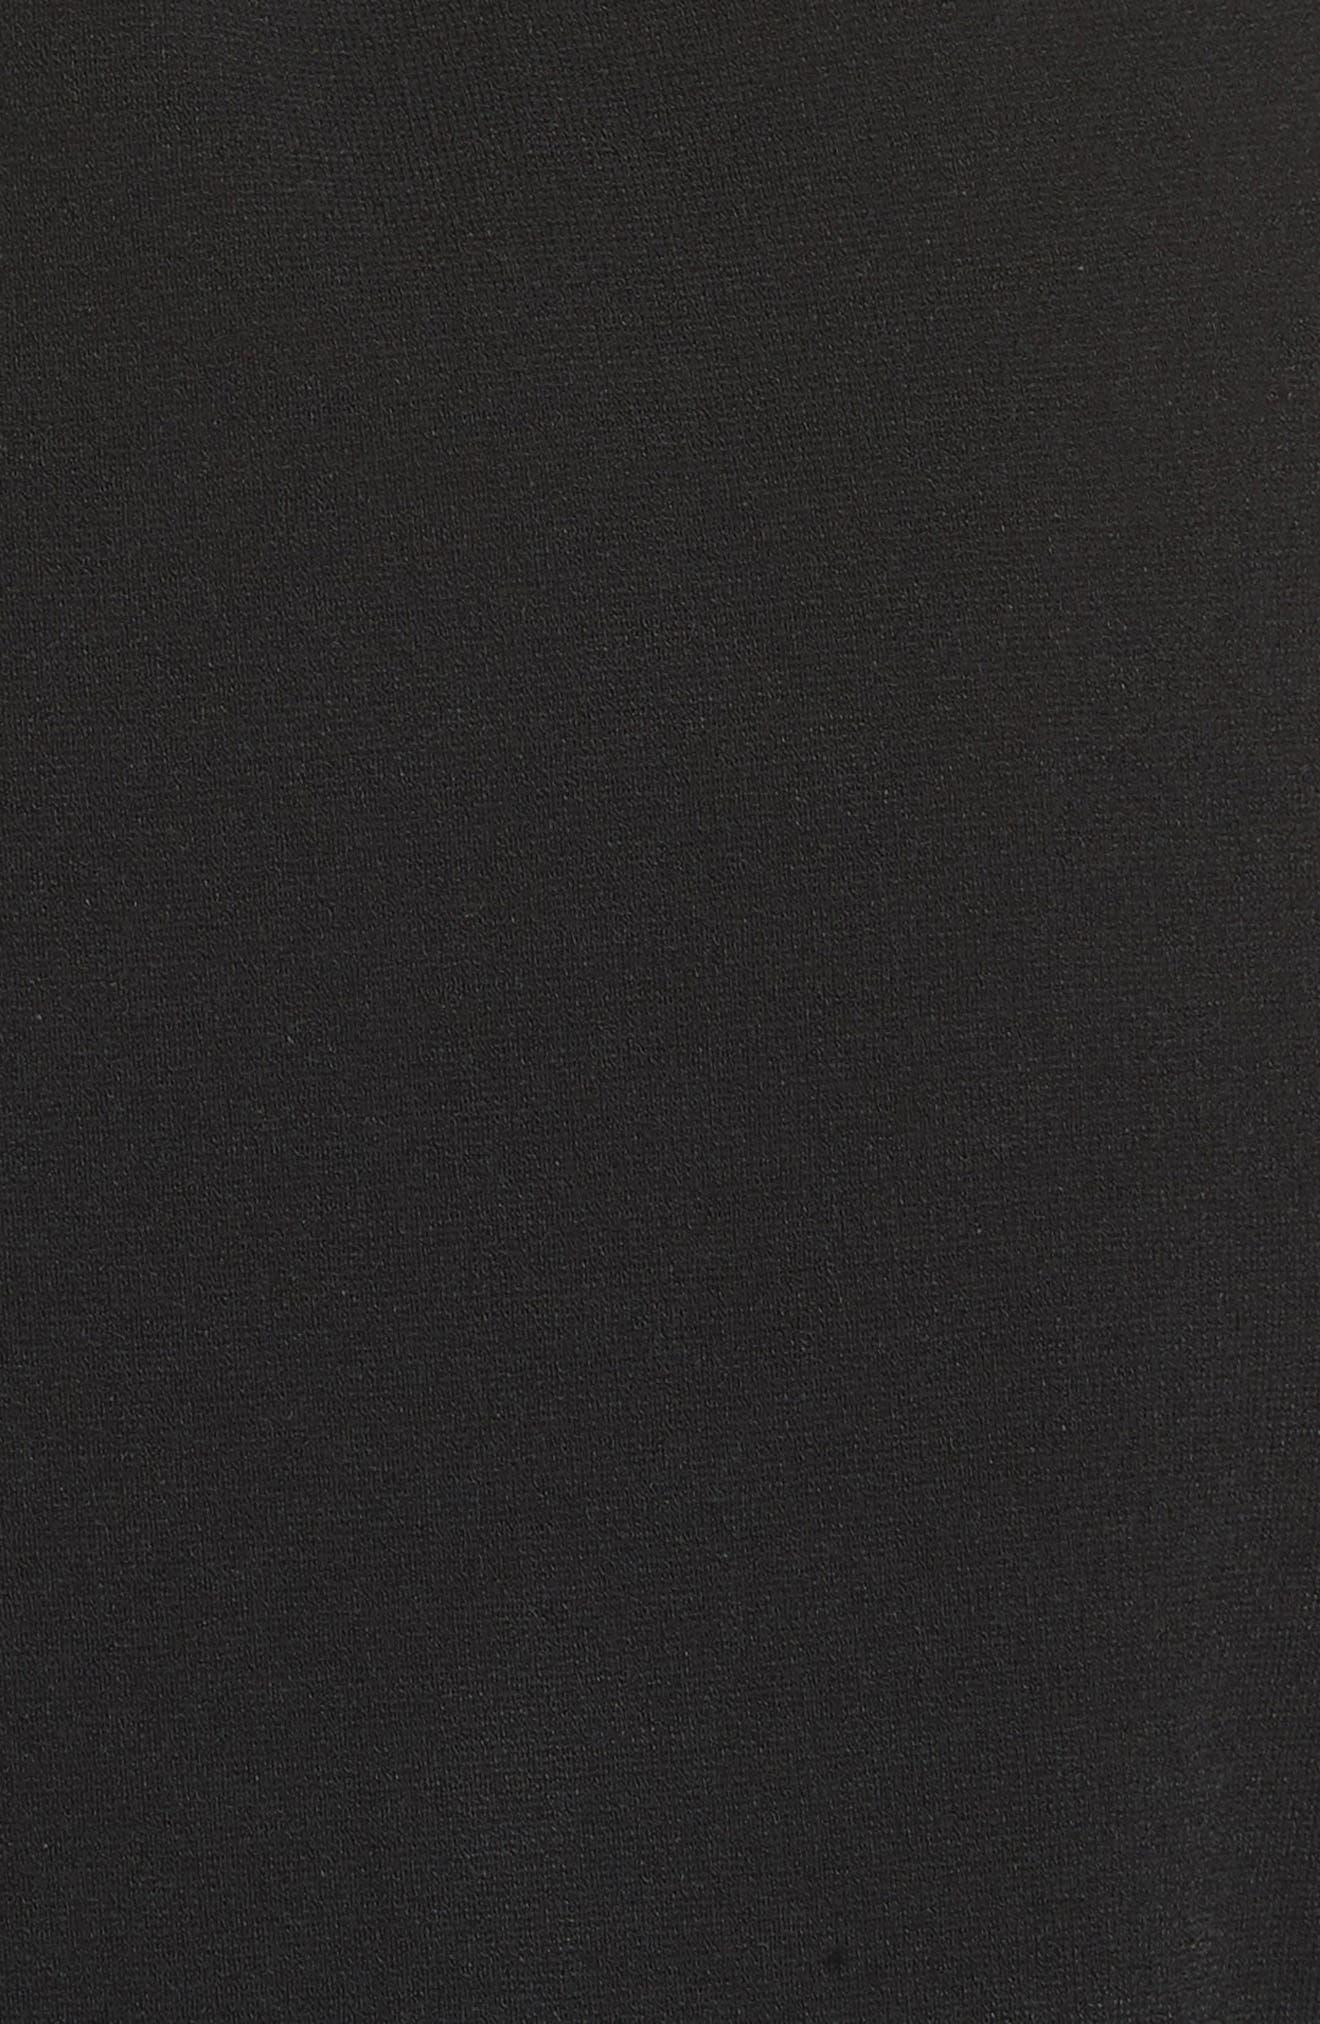 Diane von Furstenberg Wrap Sweater Dress,                             Alternate thumbnail 5, color,                             Laguna Multi